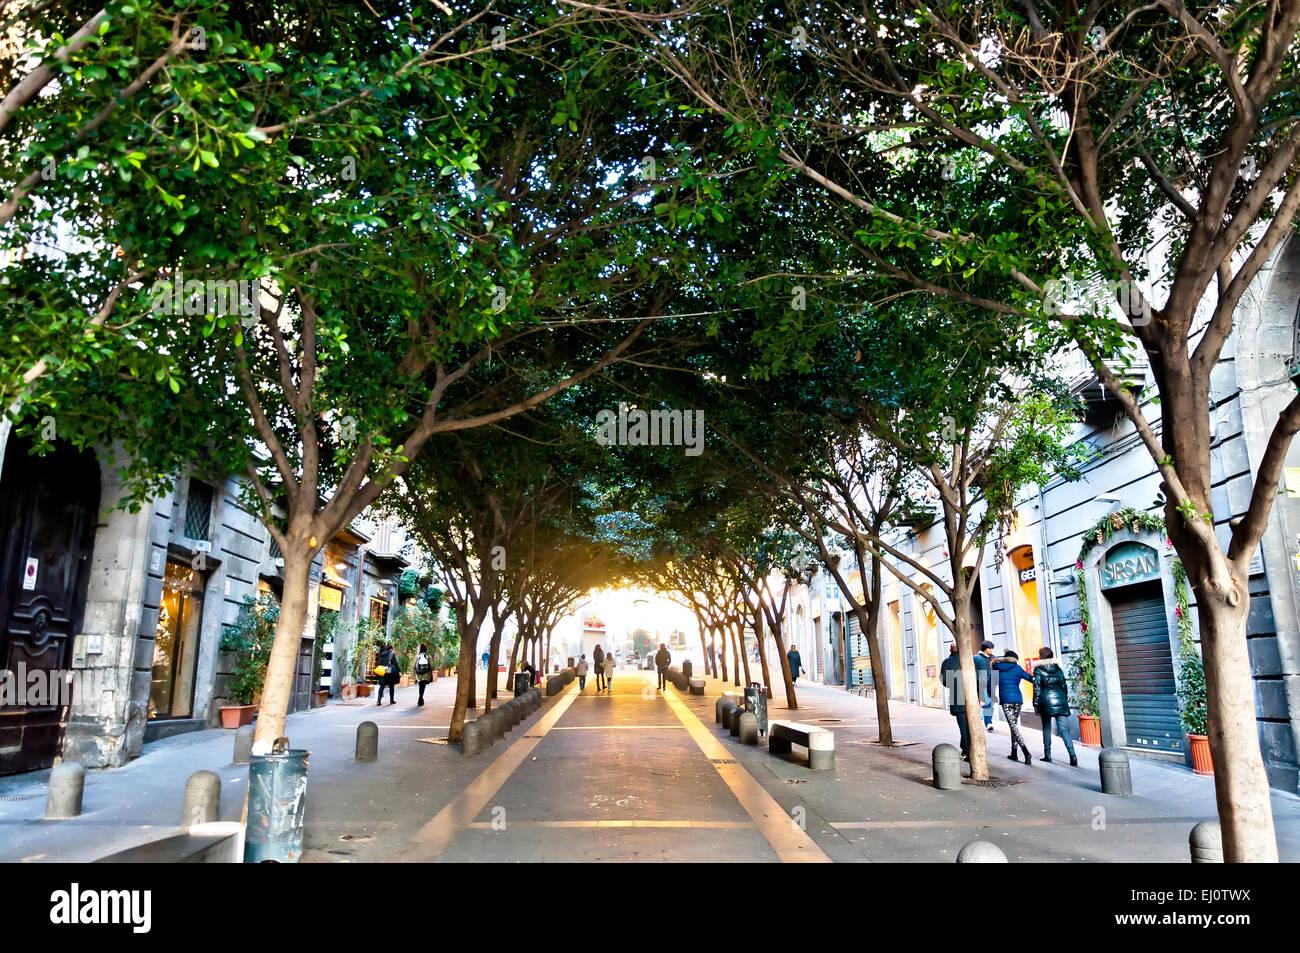 famous Via Chiaia street view in Naples, Italy. - Stock Image